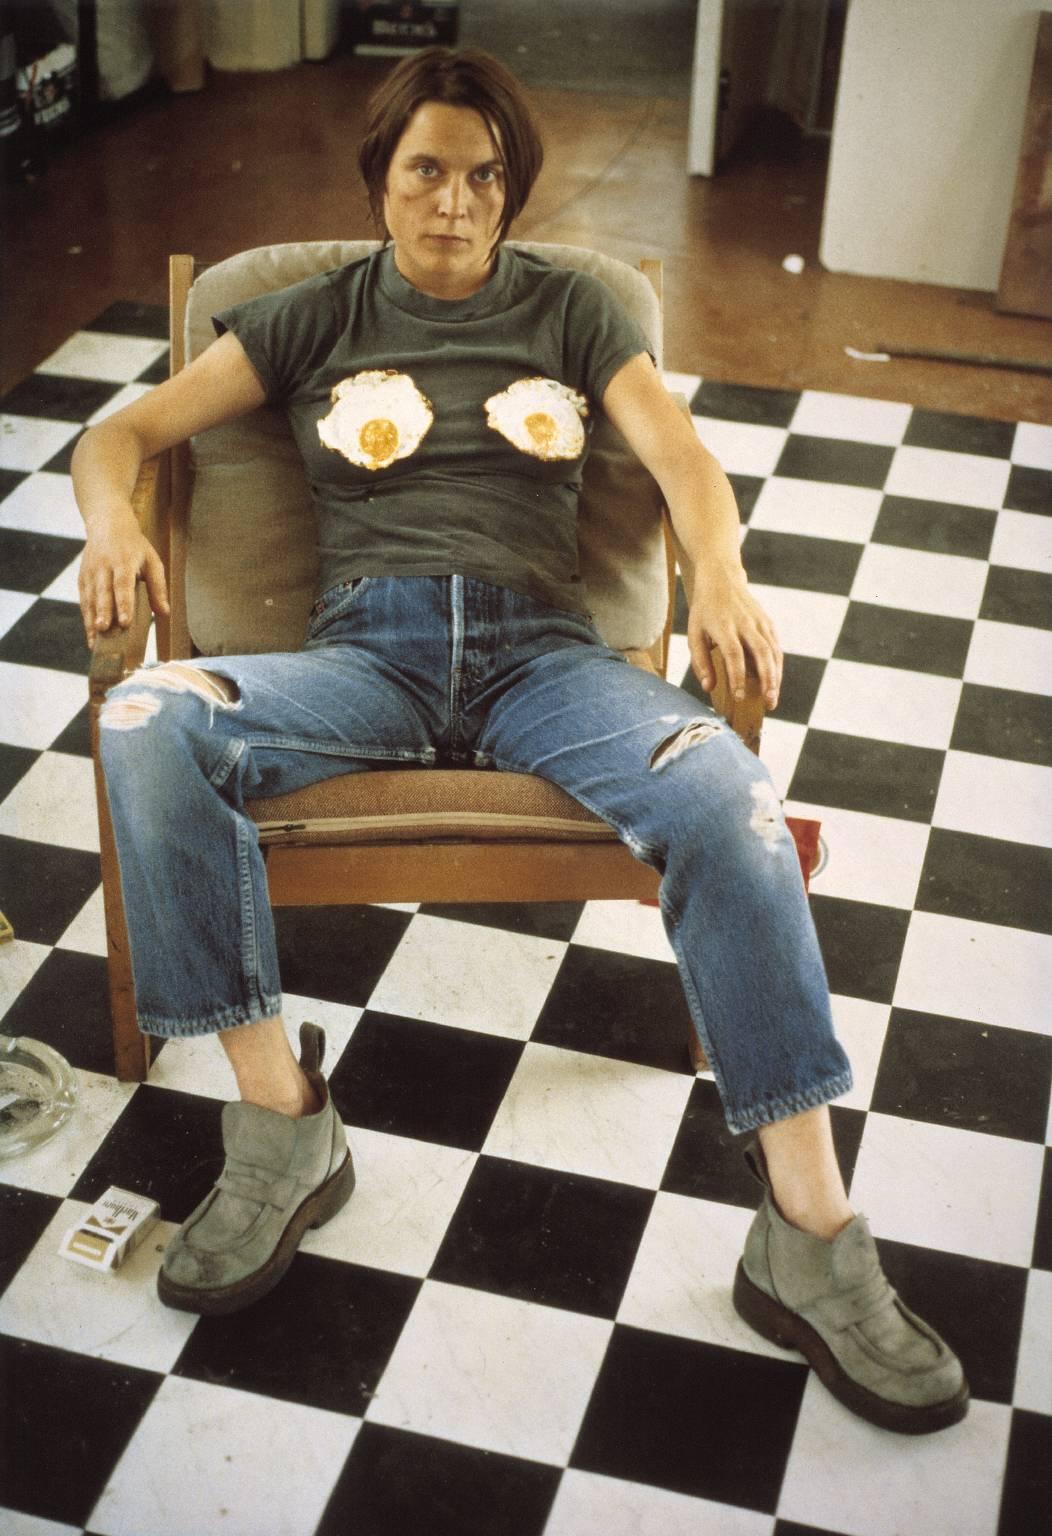 Sarah Lucas (Self Portrait with Fried Eggs), 1996